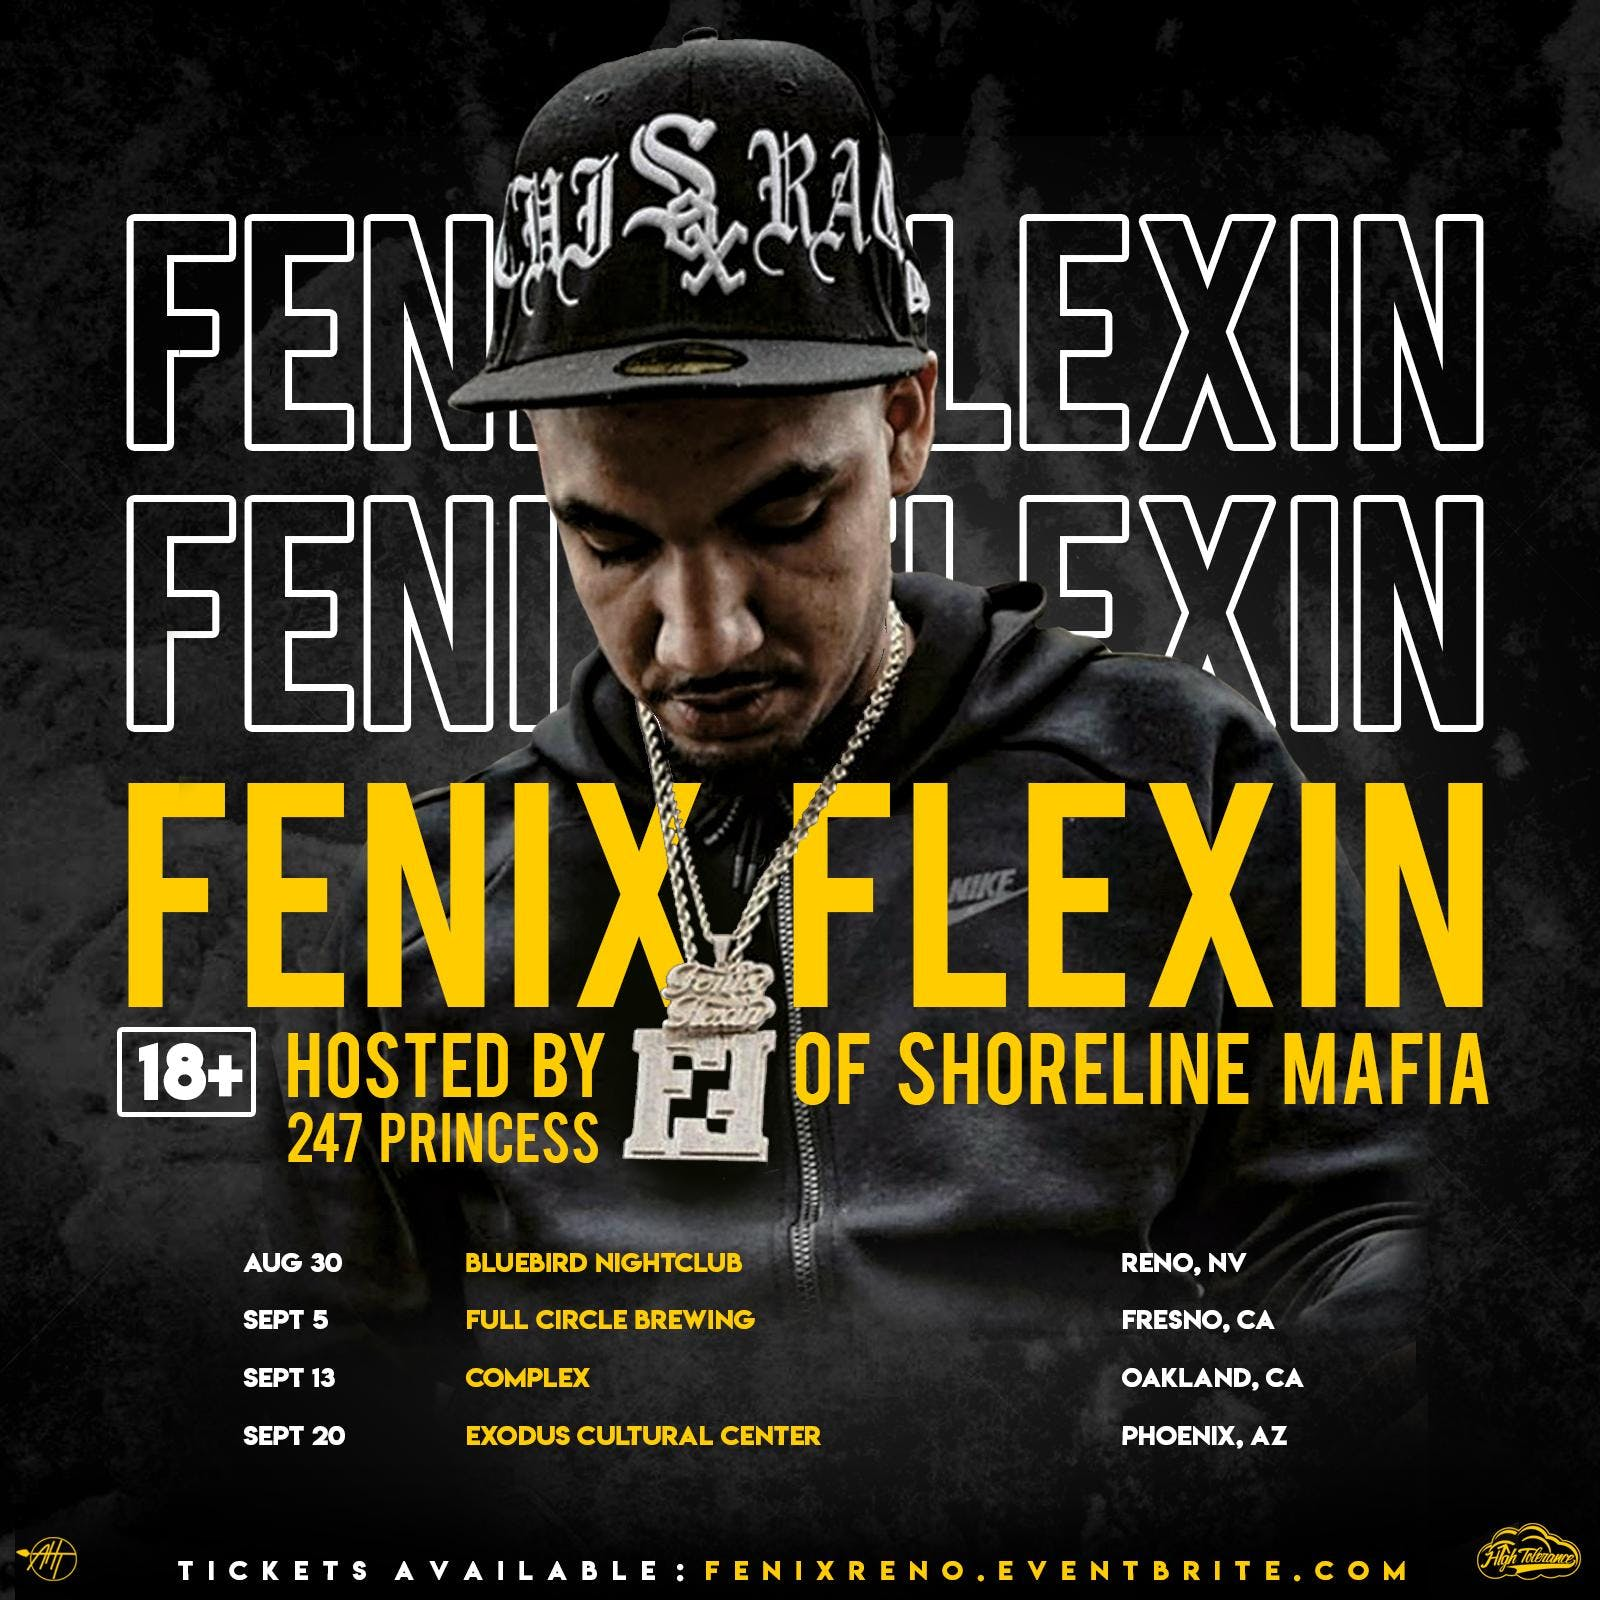 Fenix Flexin of Shoreline Mafia Live in Phoenix!